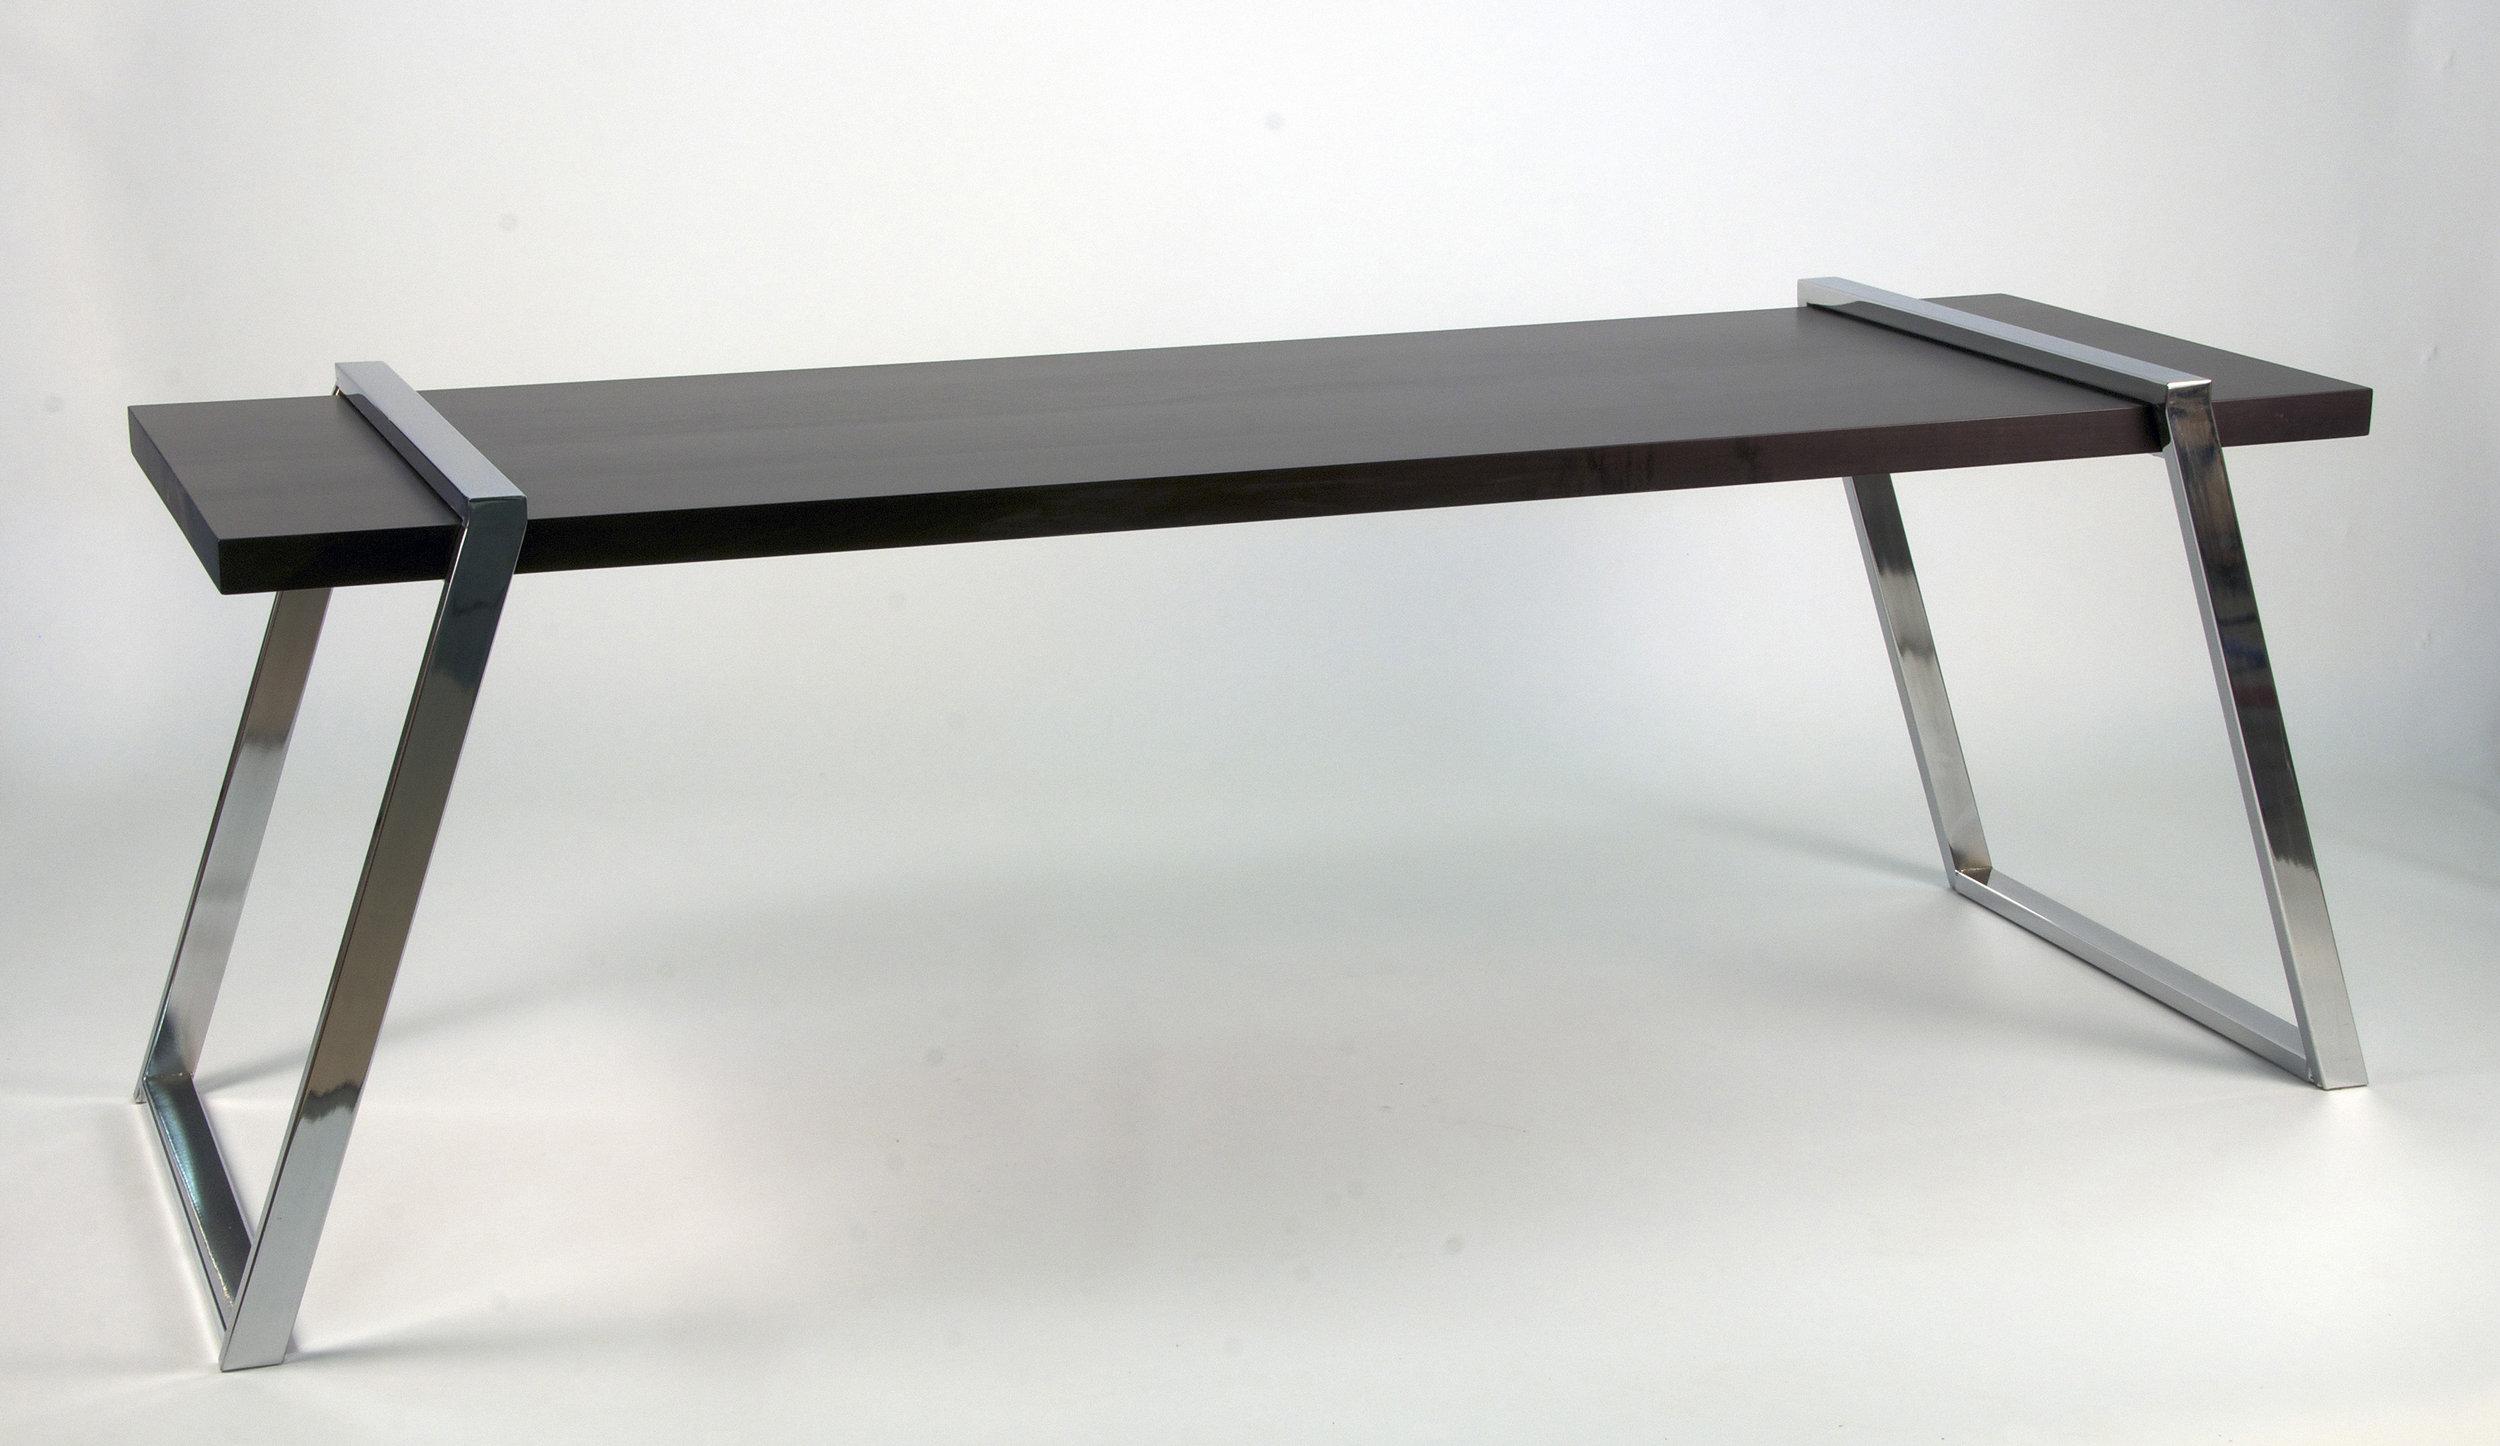 frink table for nordstrom